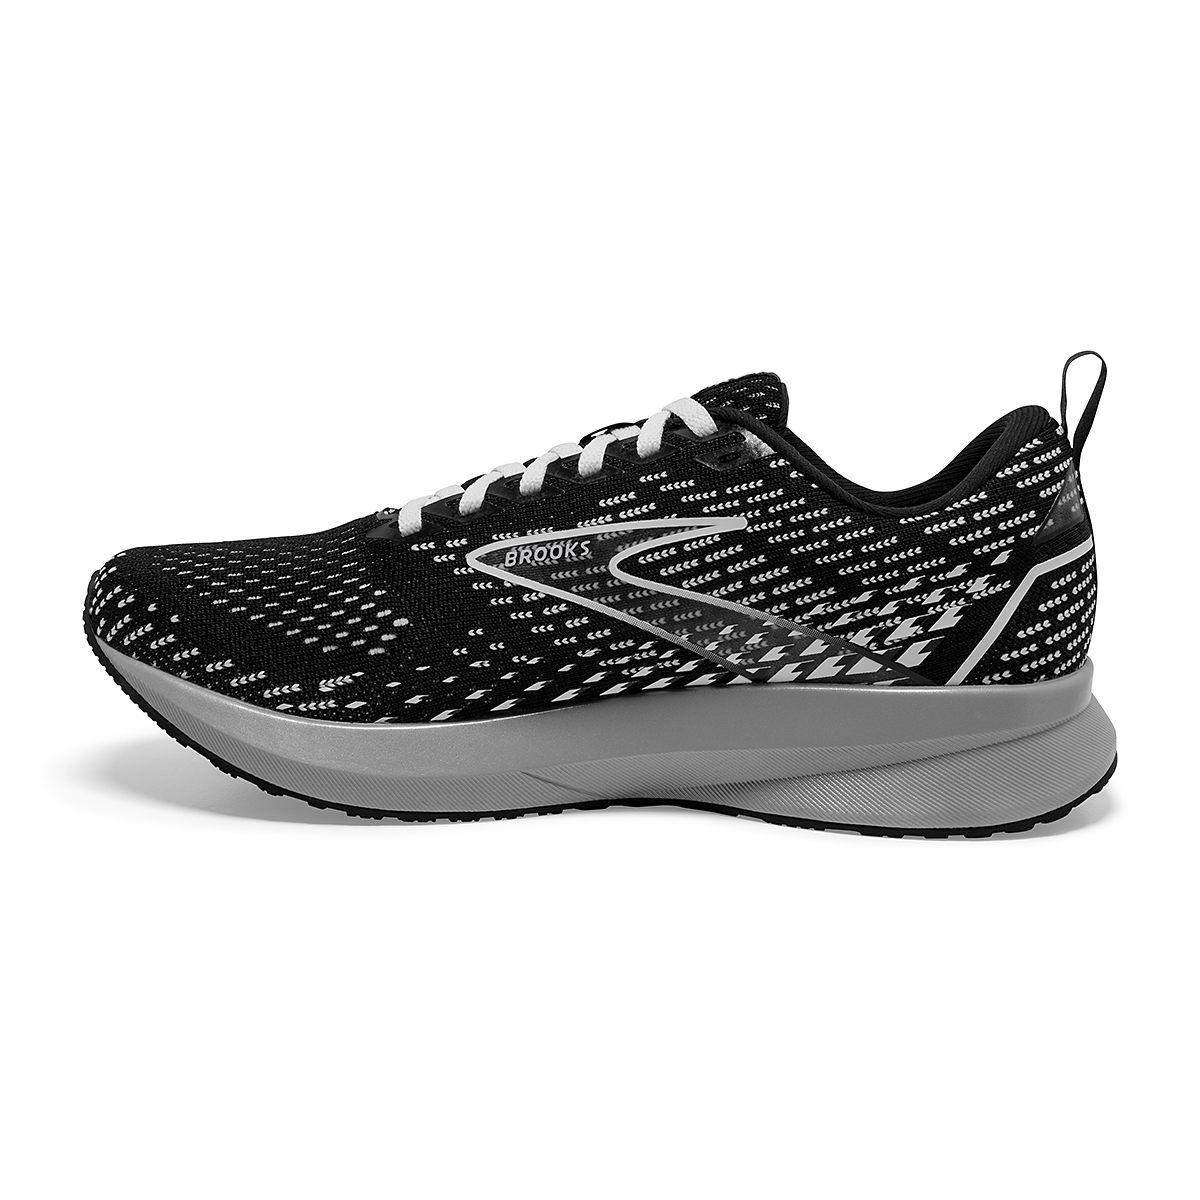 Women's Brooks Levitate 5 Running Shoe - Color: Black/Grey/White - Size: 5 - Width: Regular, Black/Grey/White, large, image 4